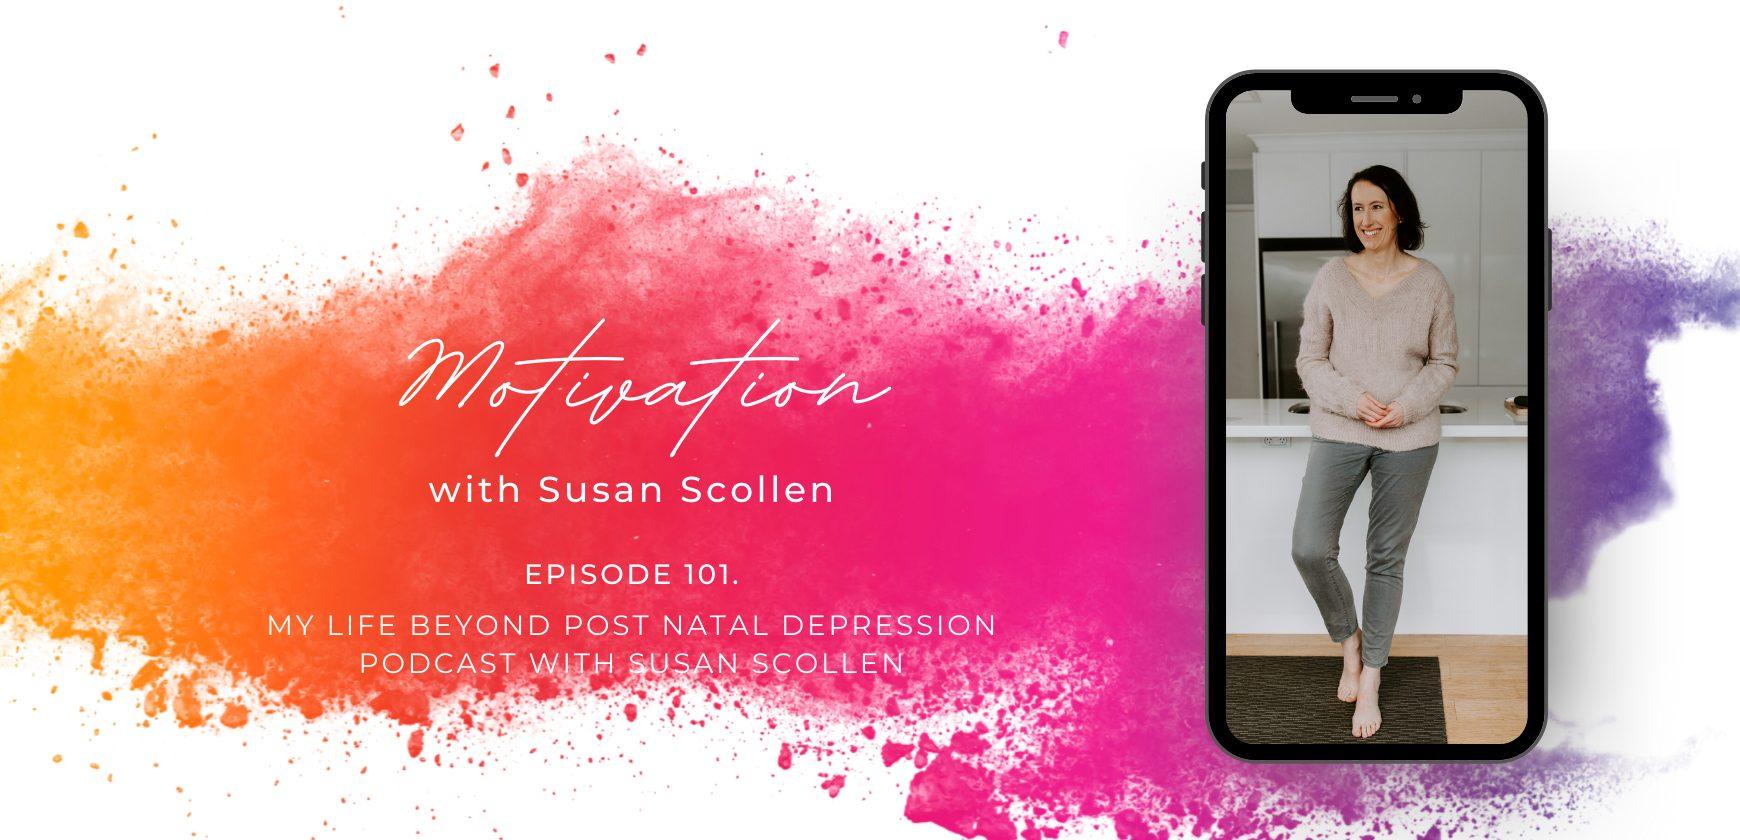 Motivation with Susan Scollen